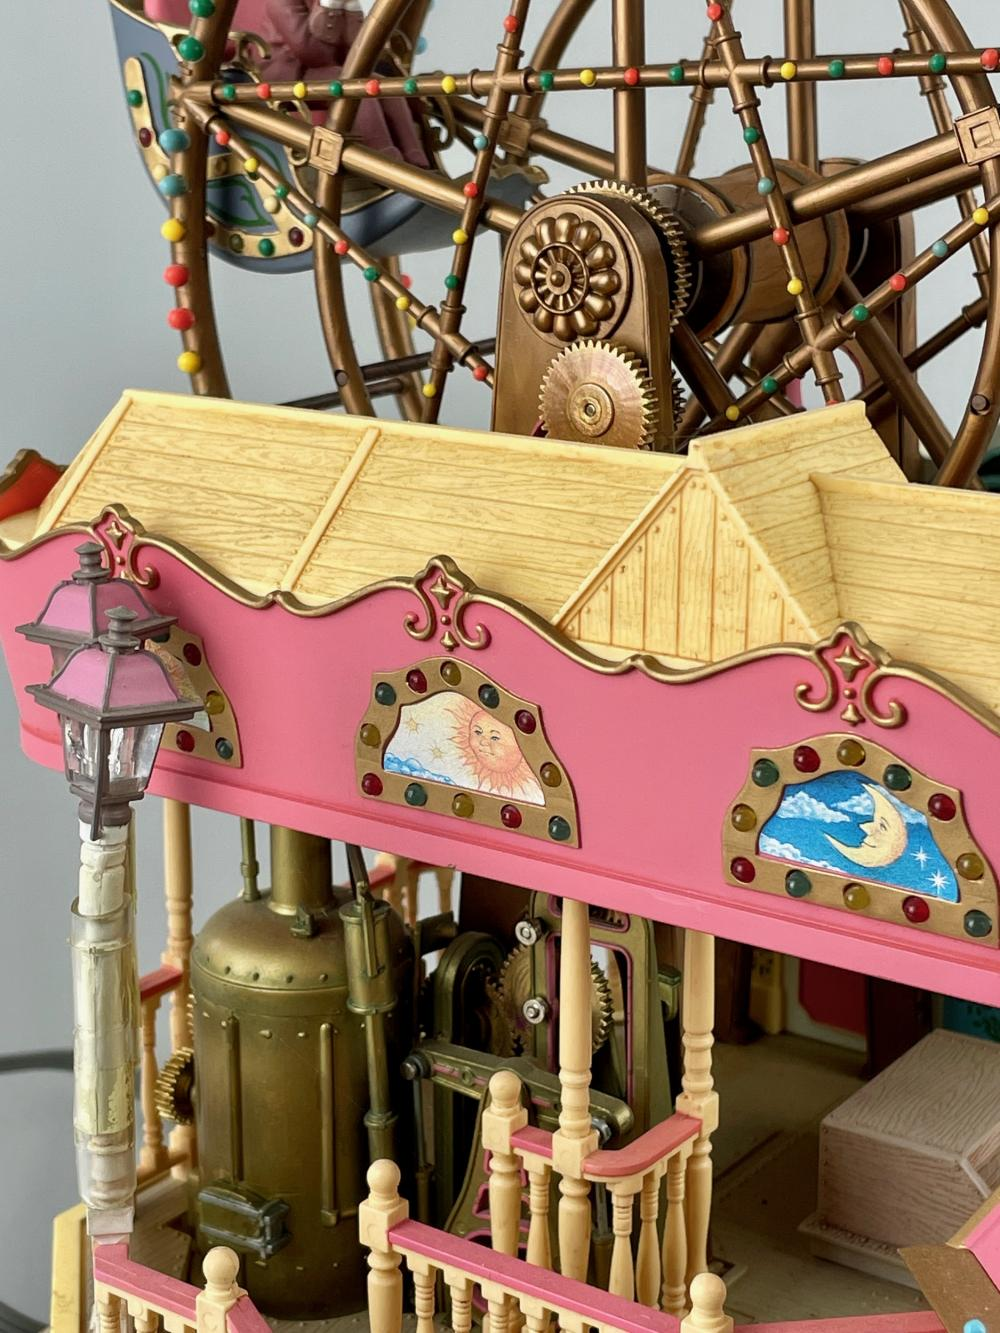 20th Century Folk Art Merry go Round